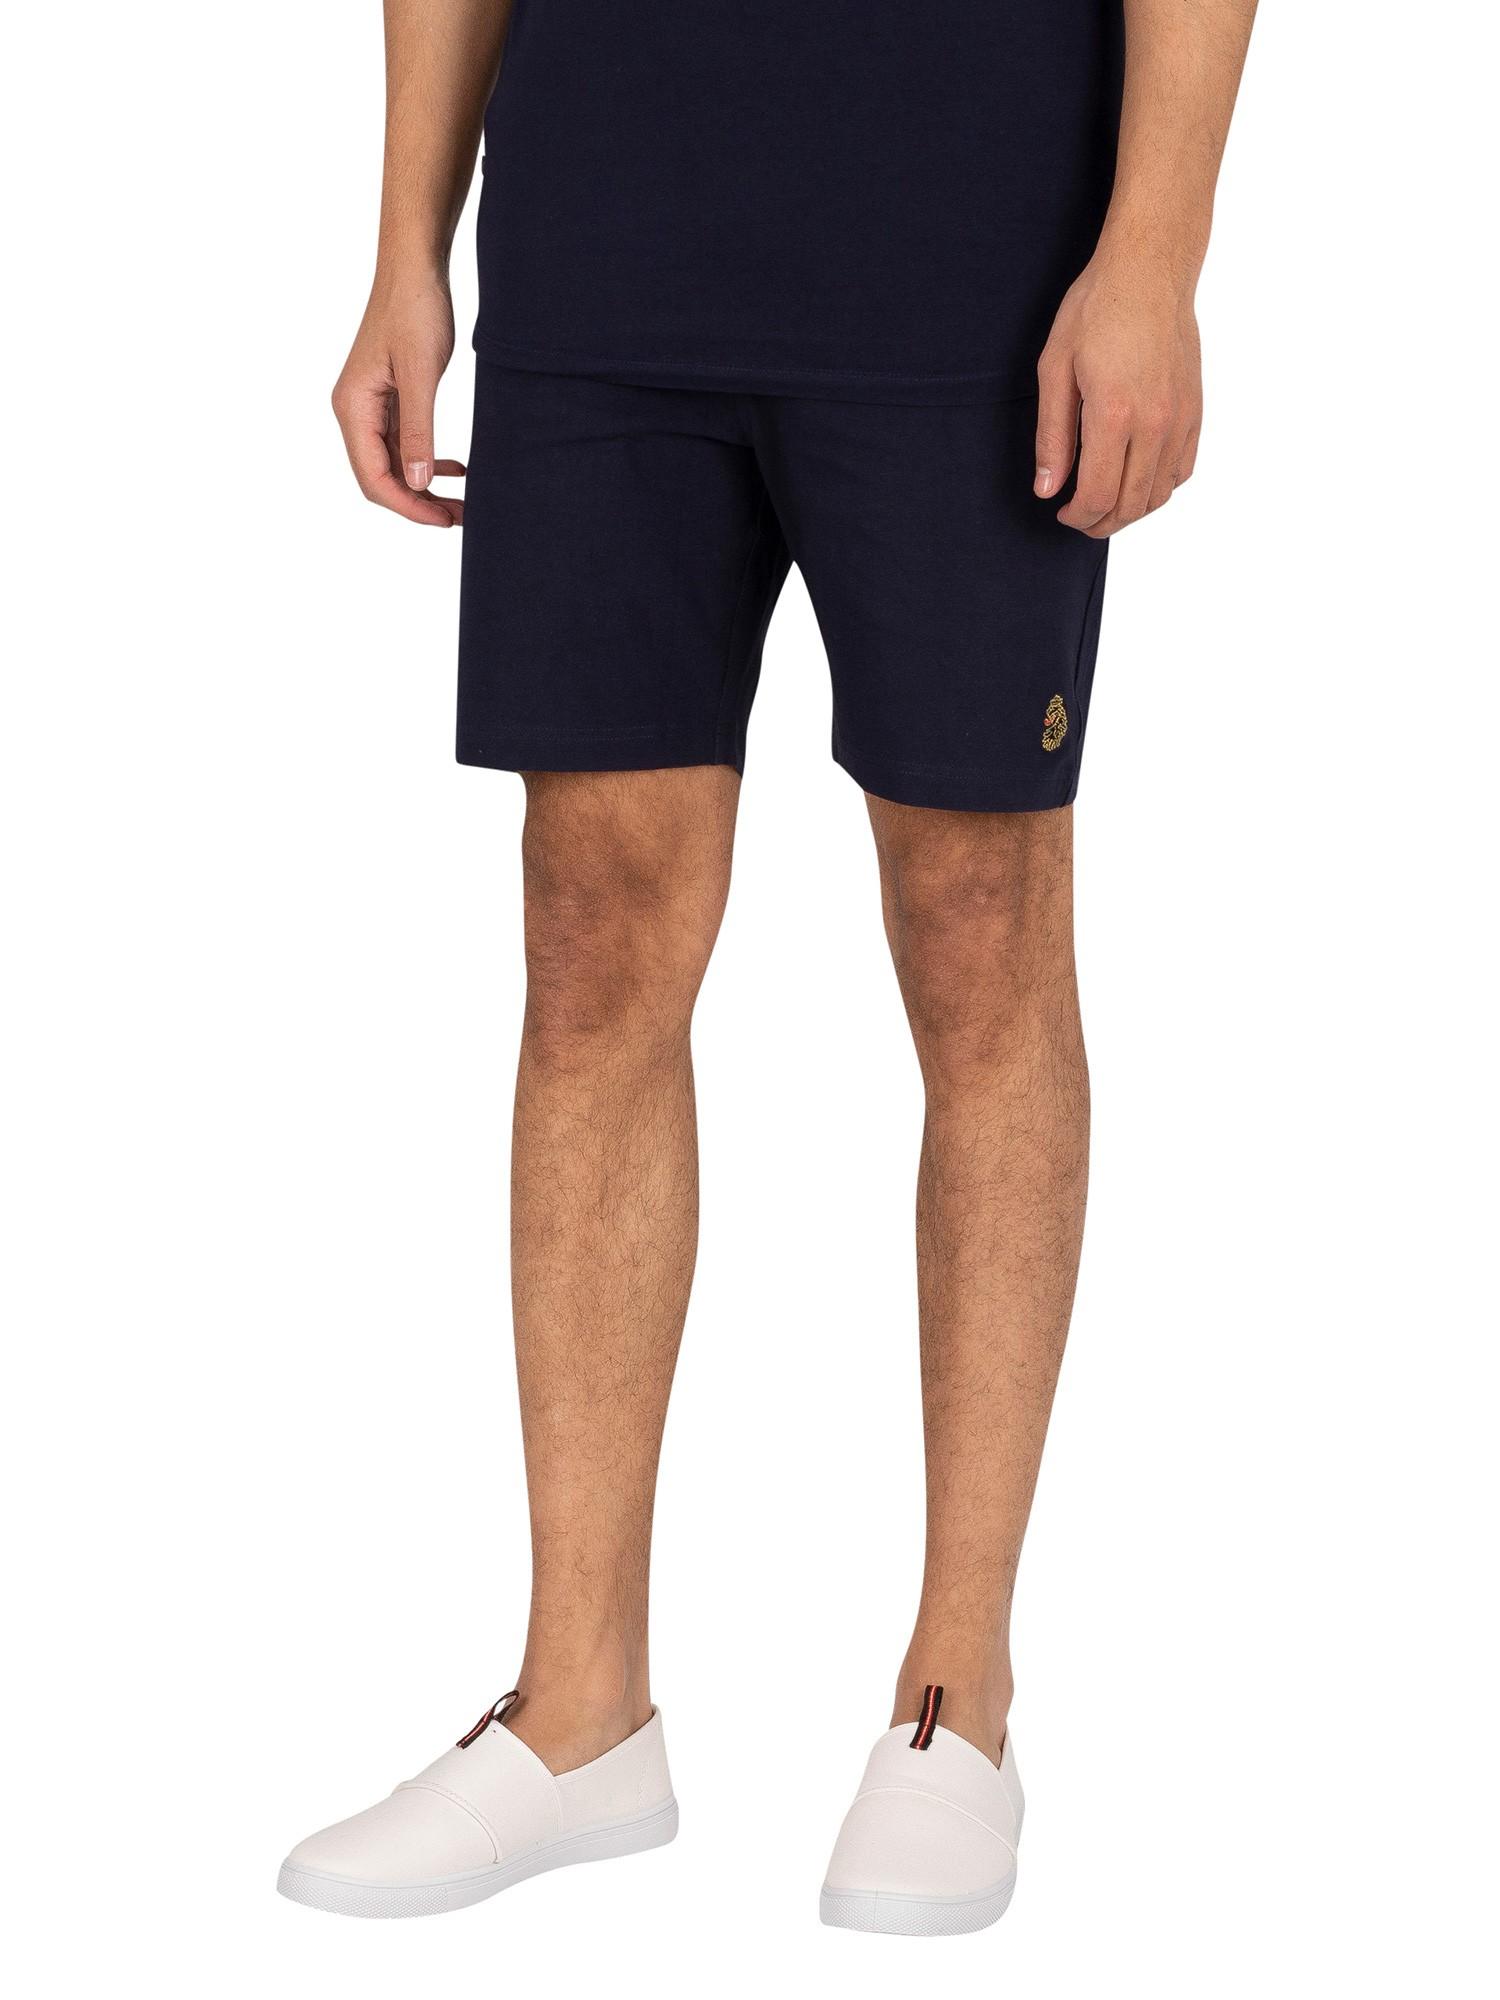 Smashing-Sweat-Shorts